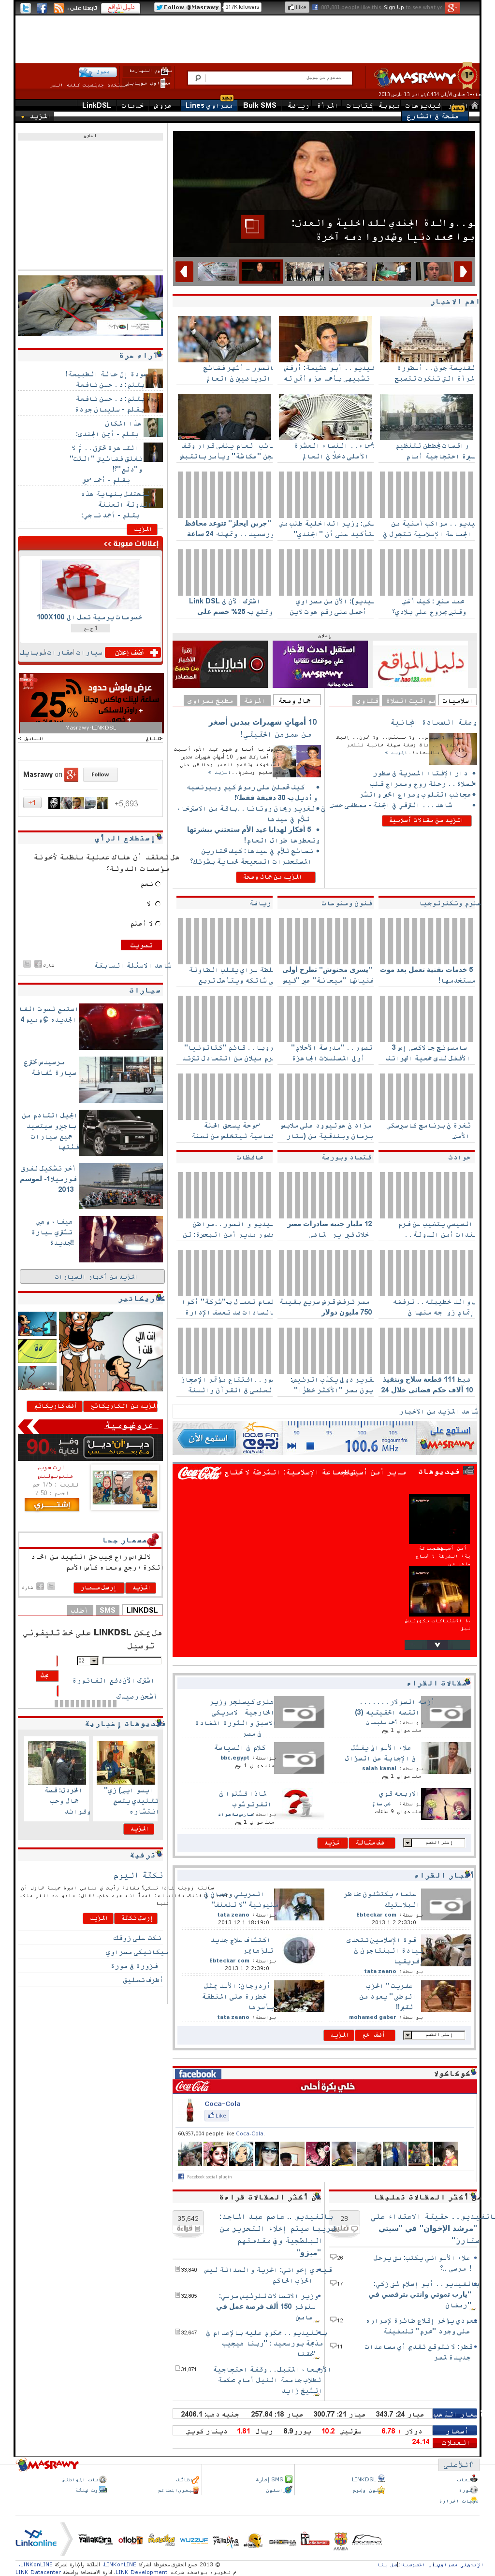 Masrawy at Wednesday March 13, 2013, 7:12 a.m. UTC